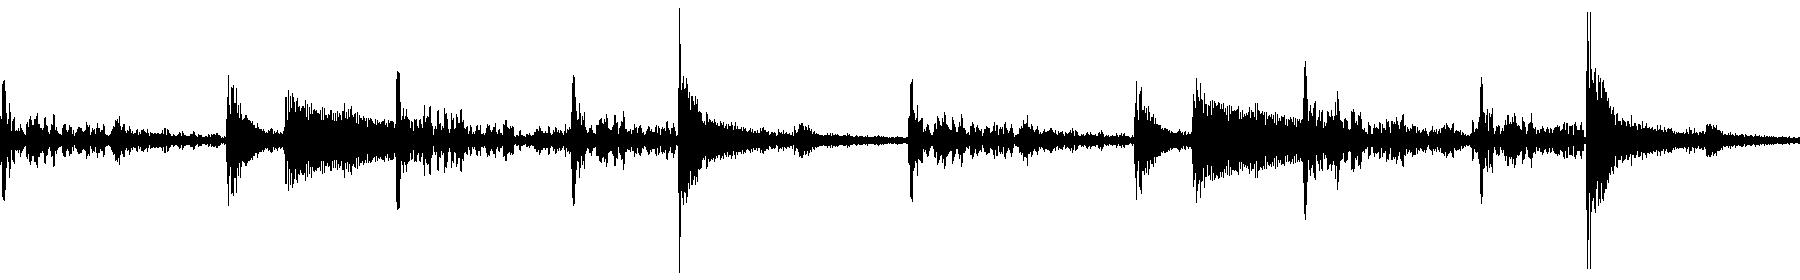 blbc jazzydrums 110 03